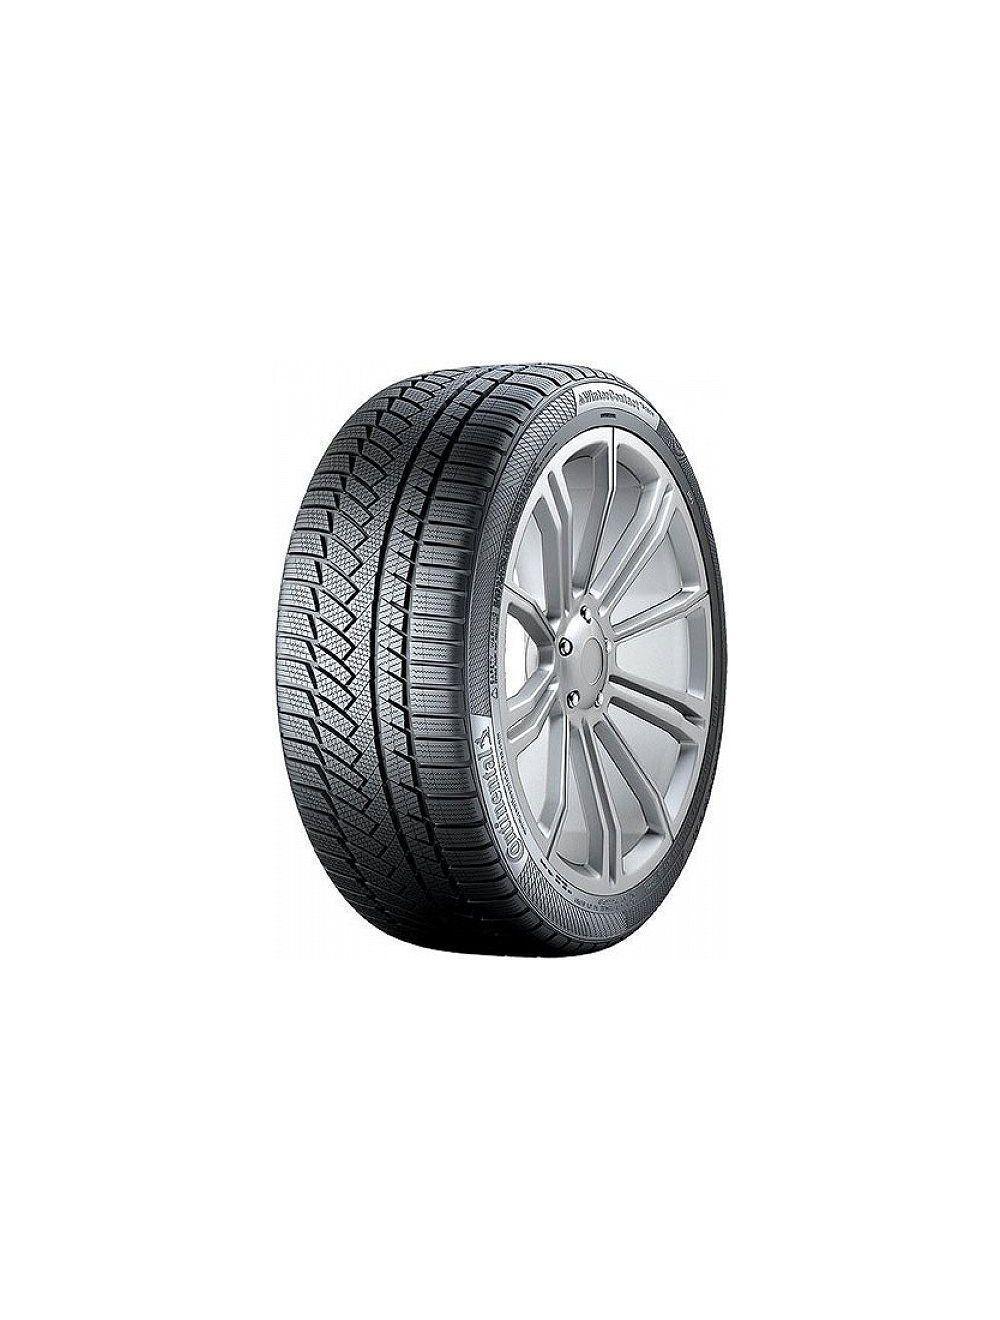 Continental 275/50R20 V TS 850P SUV XL FR MO Téli gumi